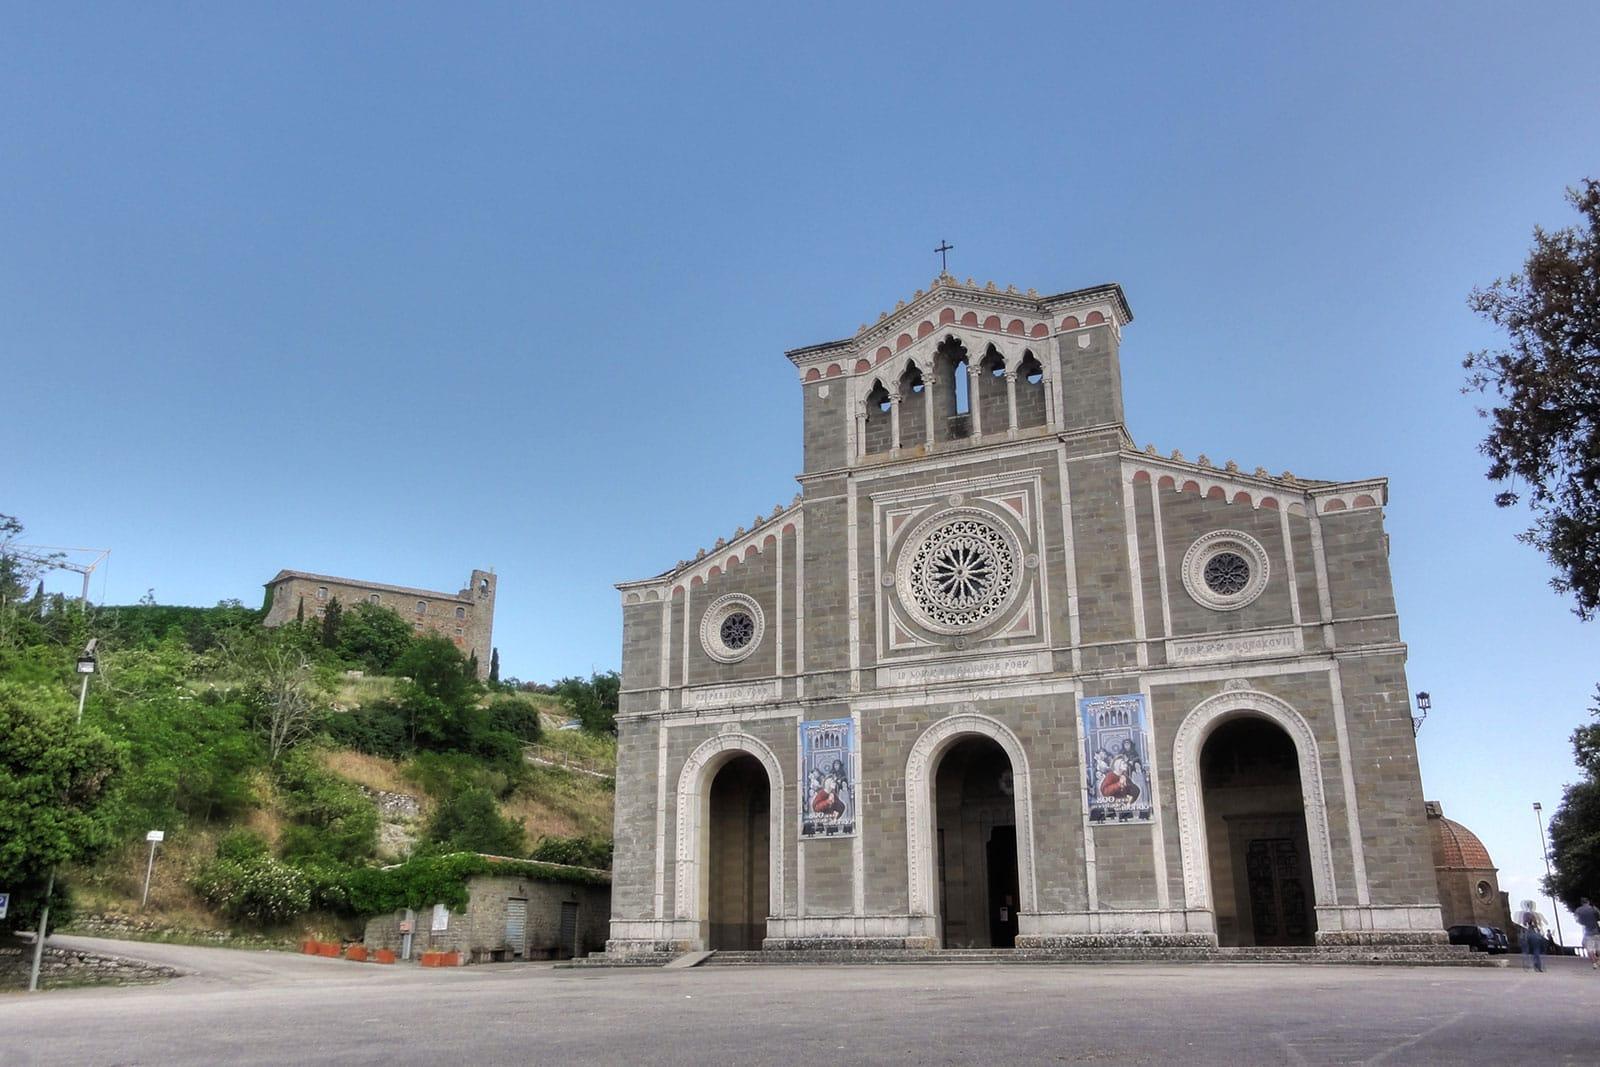 Santa Magherita, Cortona